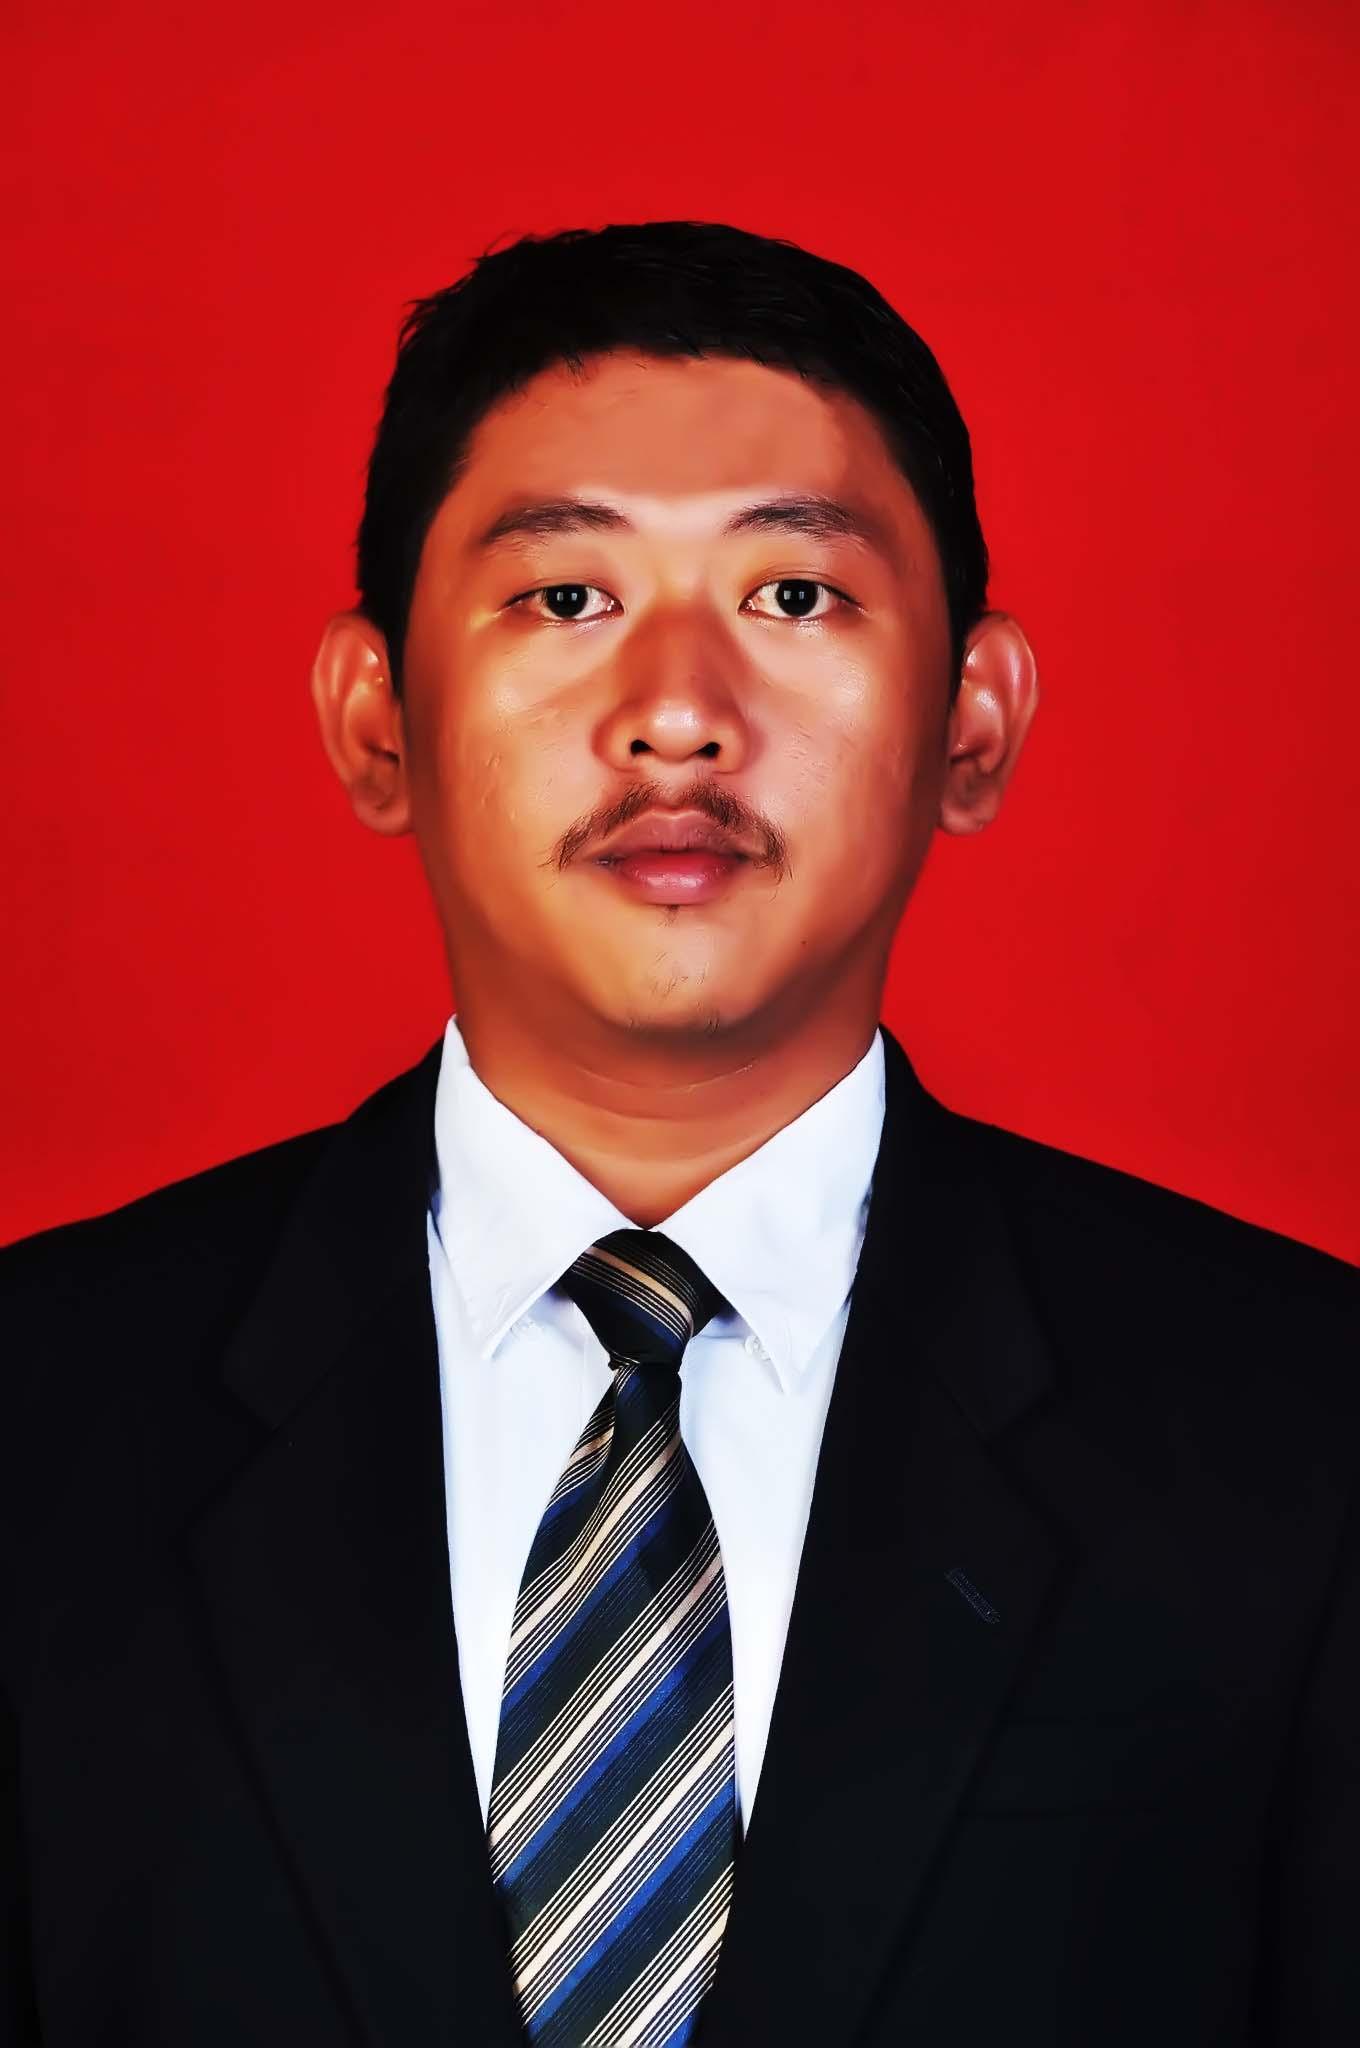 Chendri Irawan Satrio Nugroho